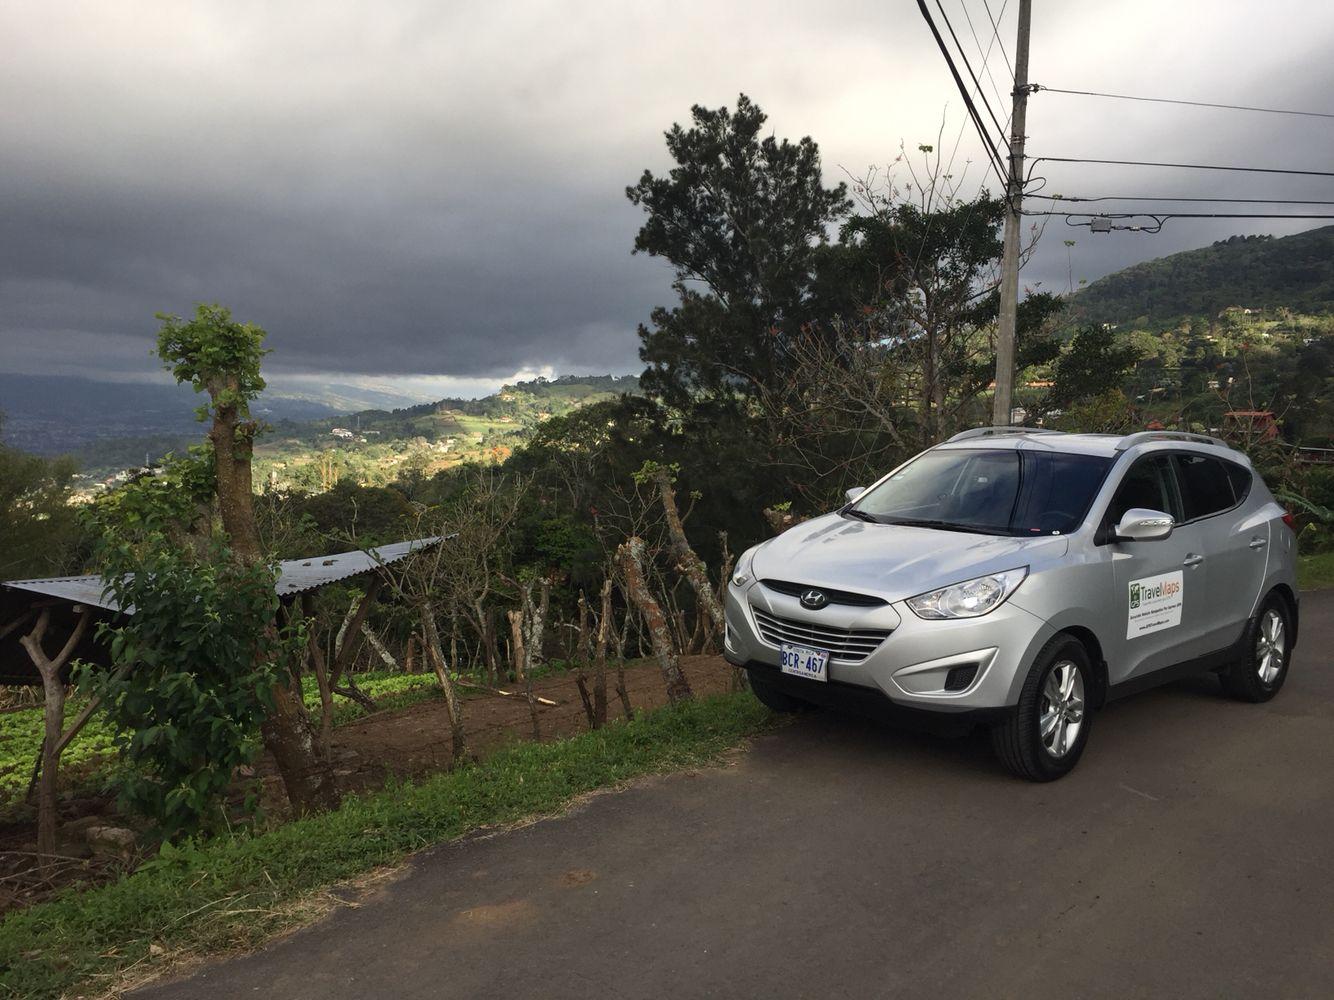 Driving in Costa Rica httpwwwgpstravelmapscomgpsmapscentral